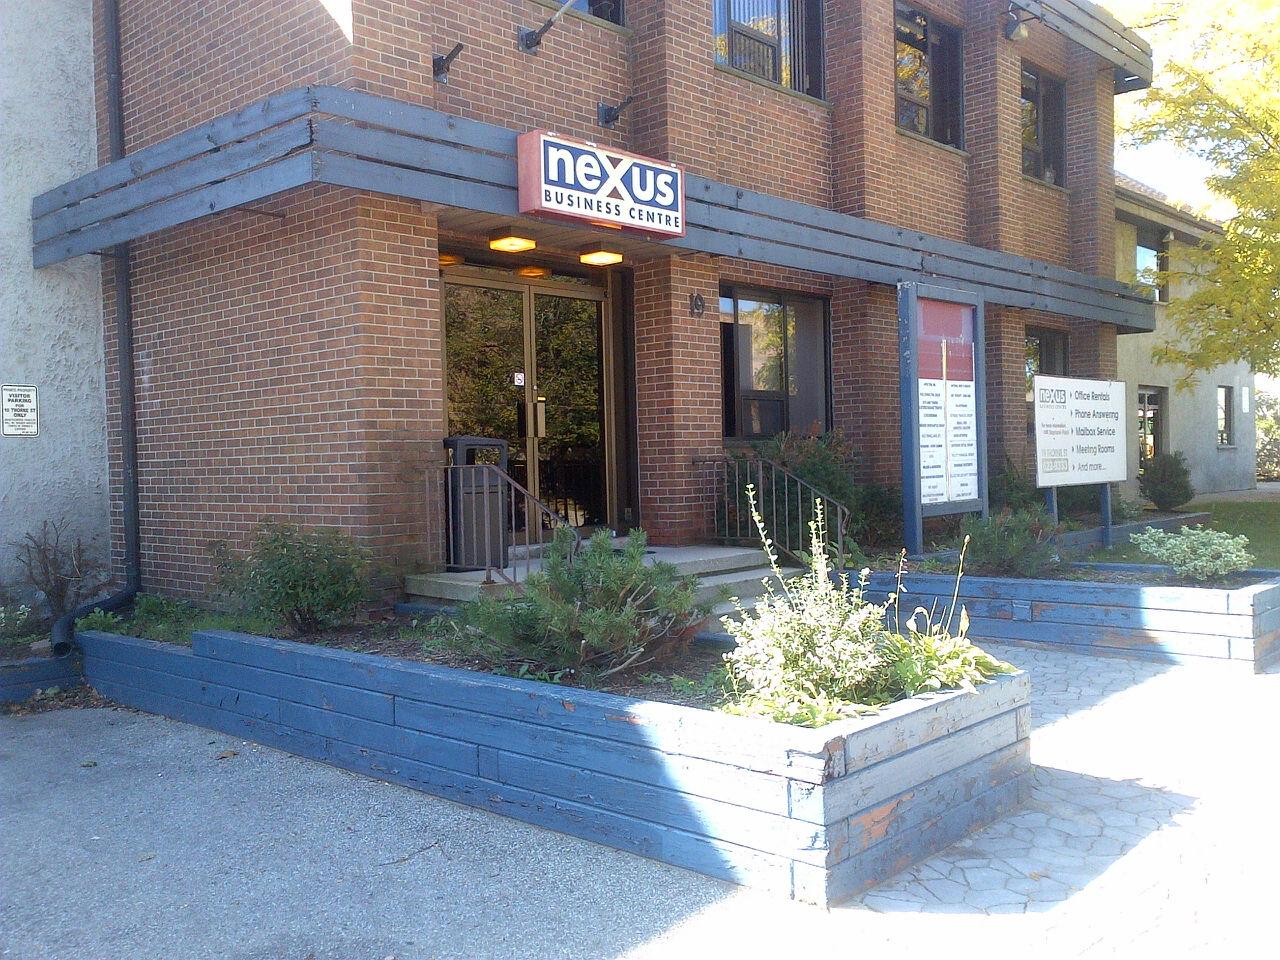 Nexus Business Centre